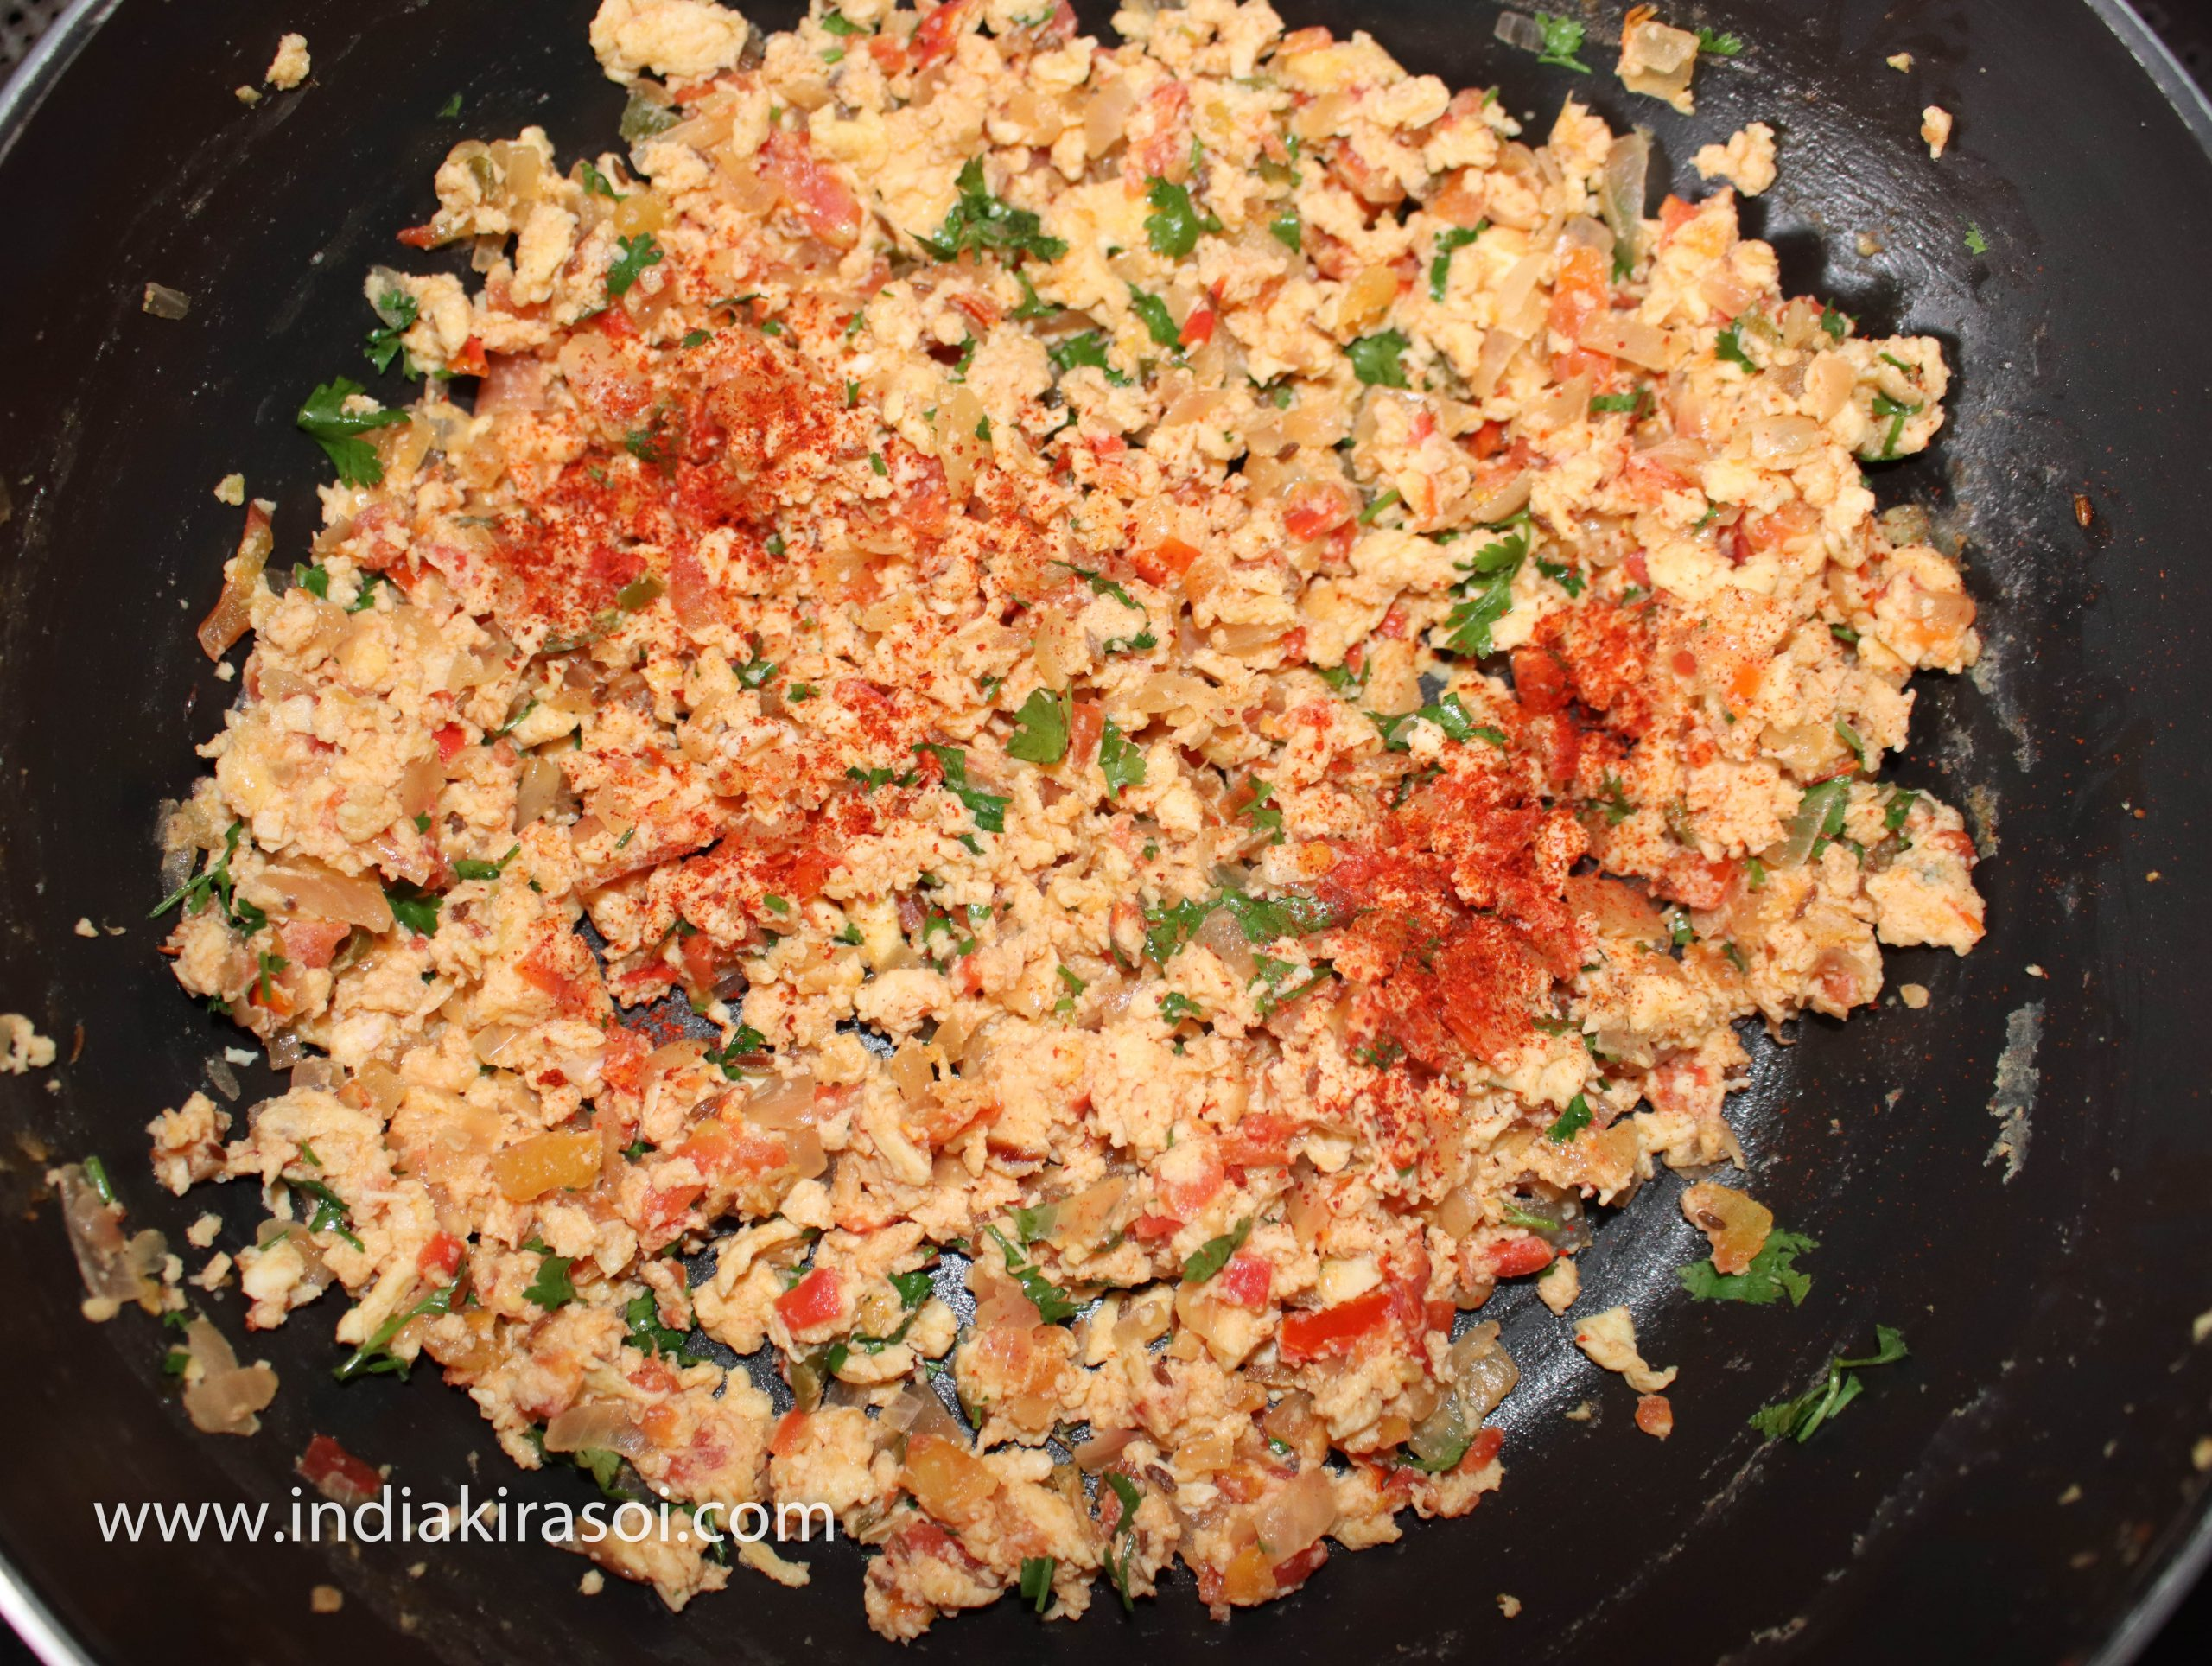 Then add 1/4 teaspoon red chili powder.